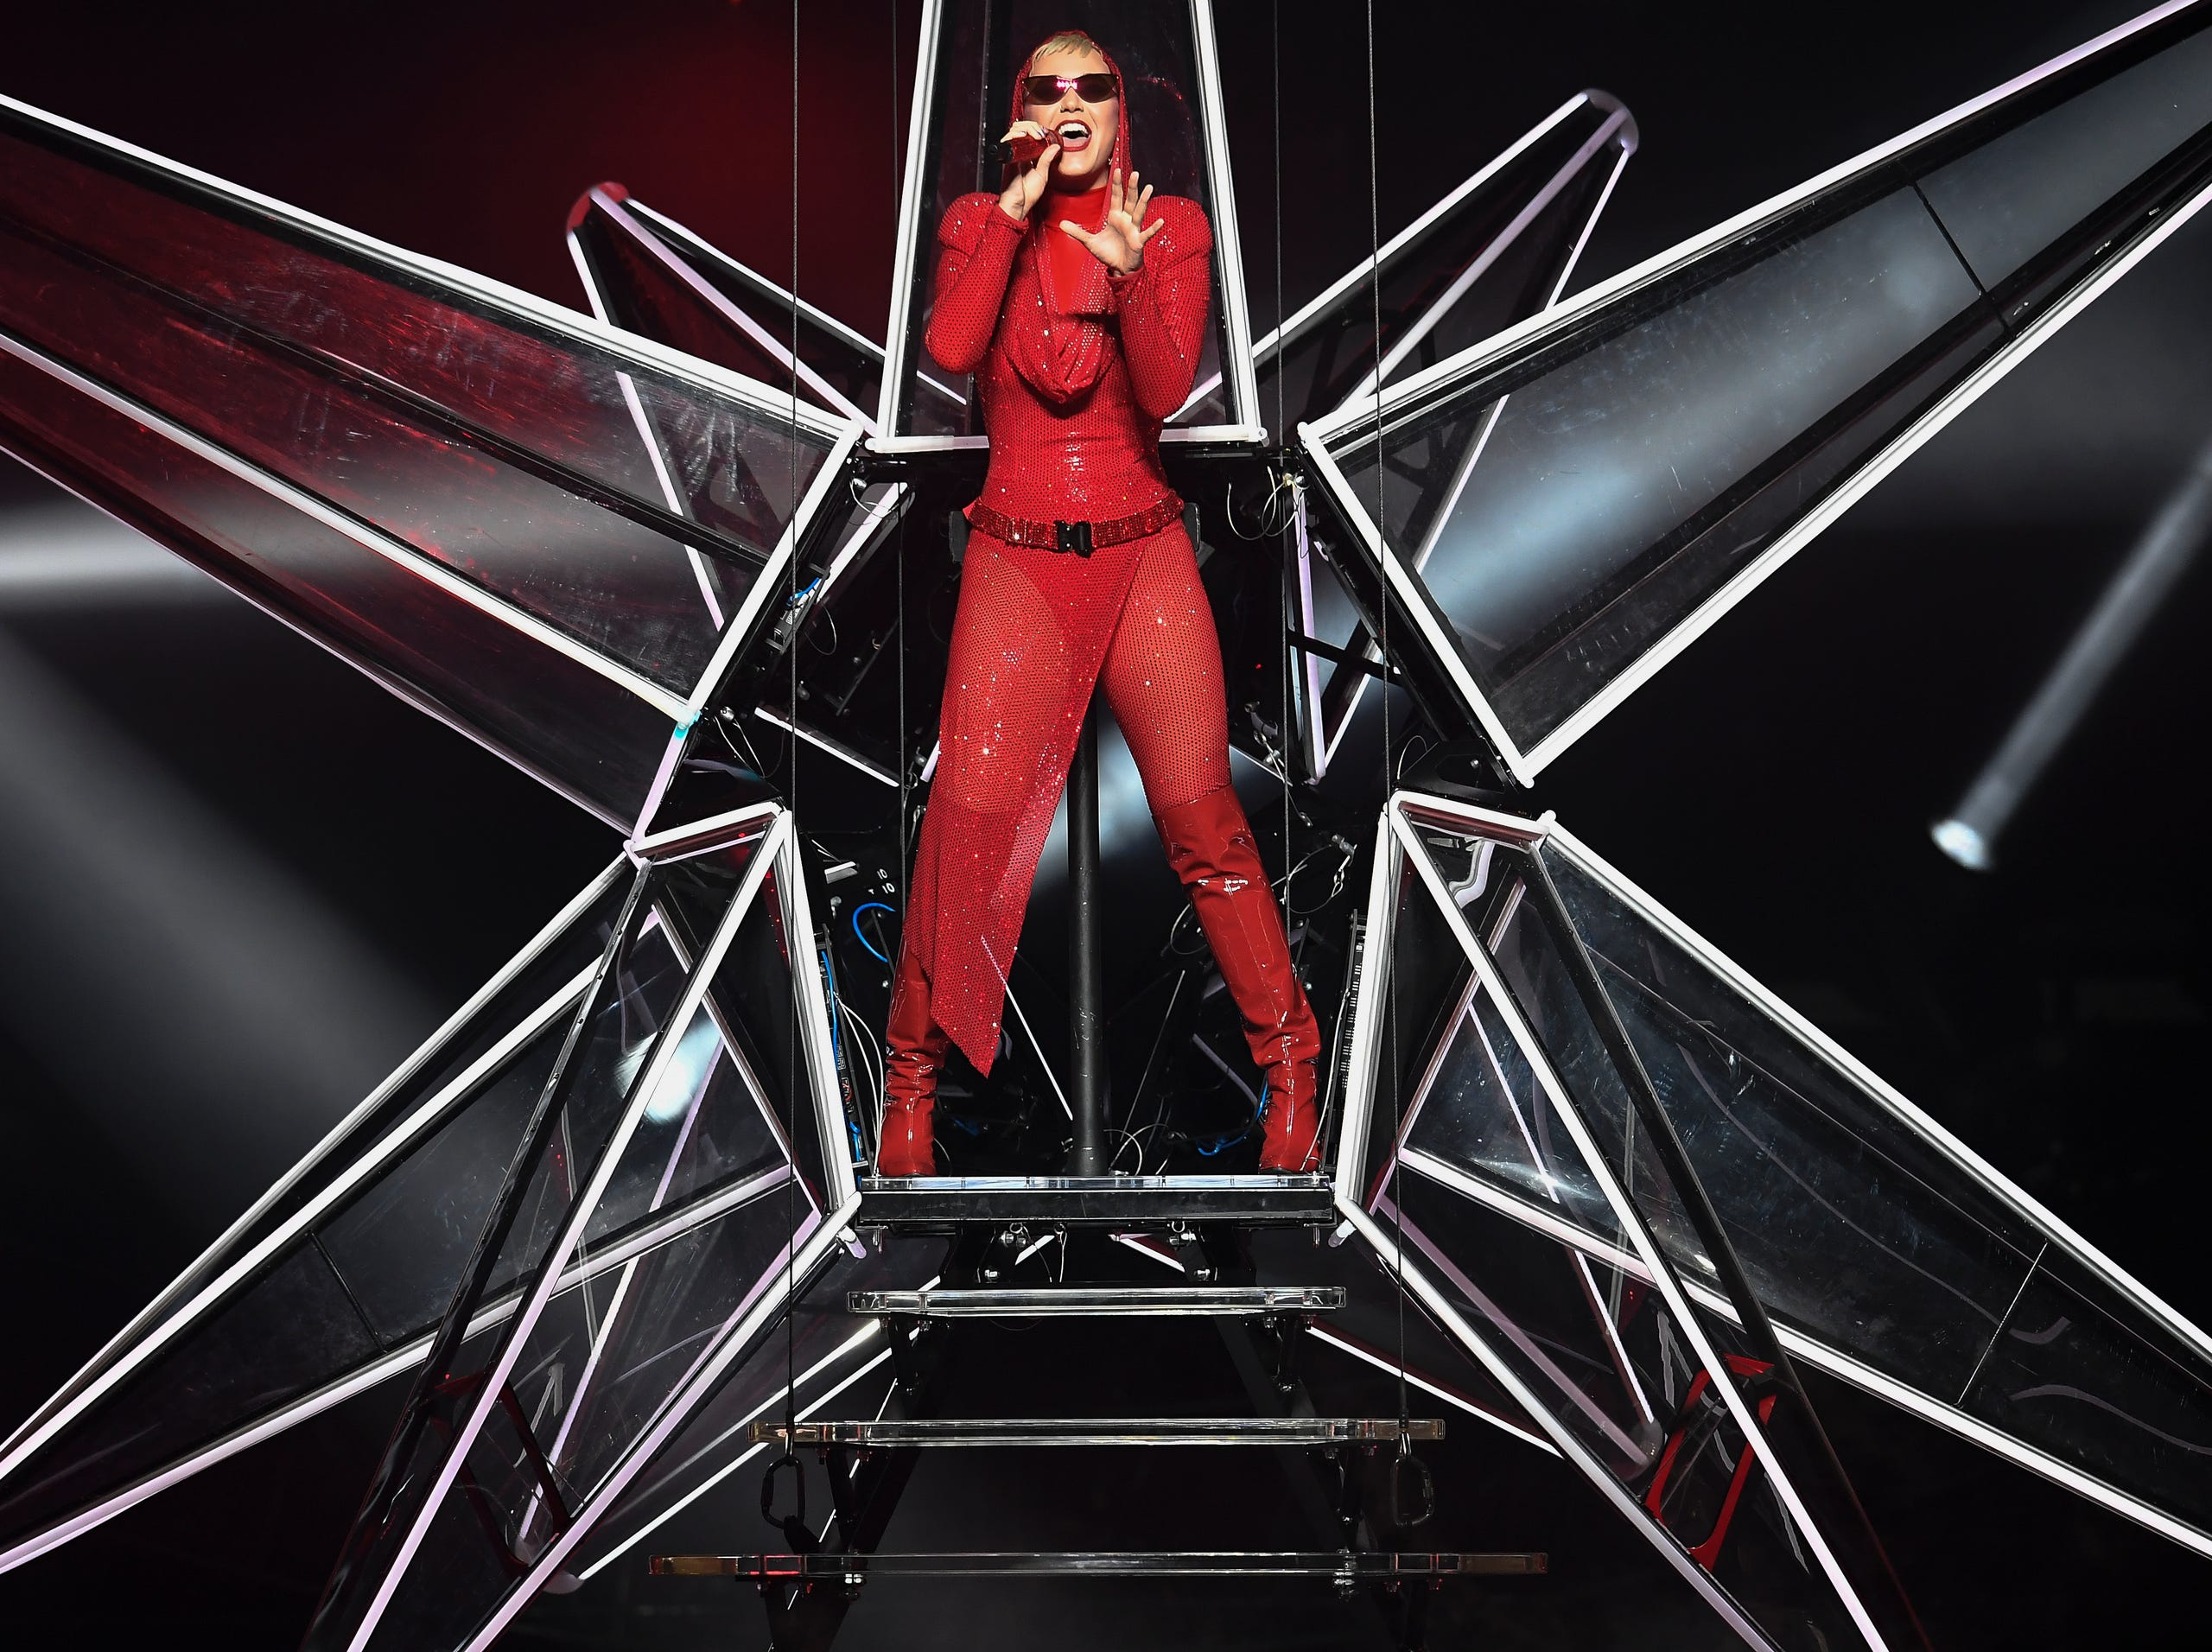 Katy Perry Performs At Bridgestone Arena